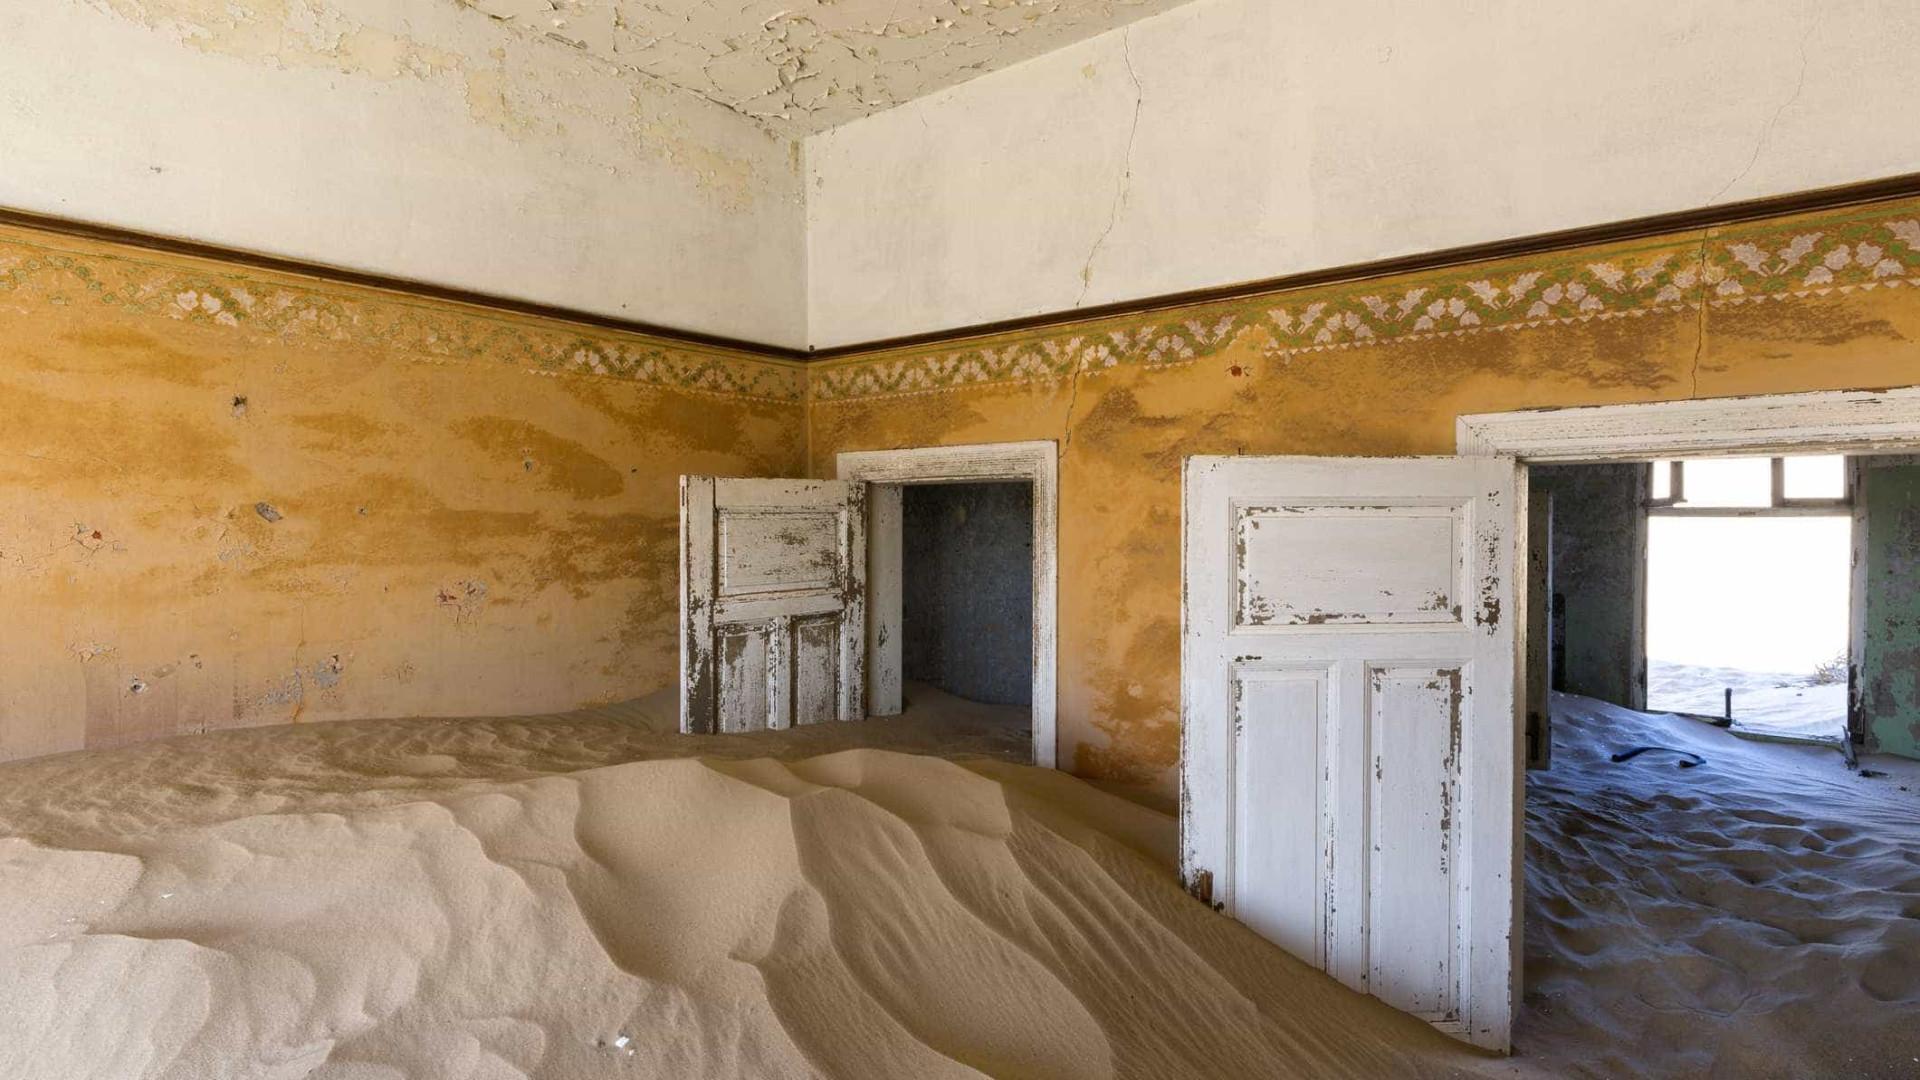 Kolmanskop: cidade fantasma no deserto de Namíbia